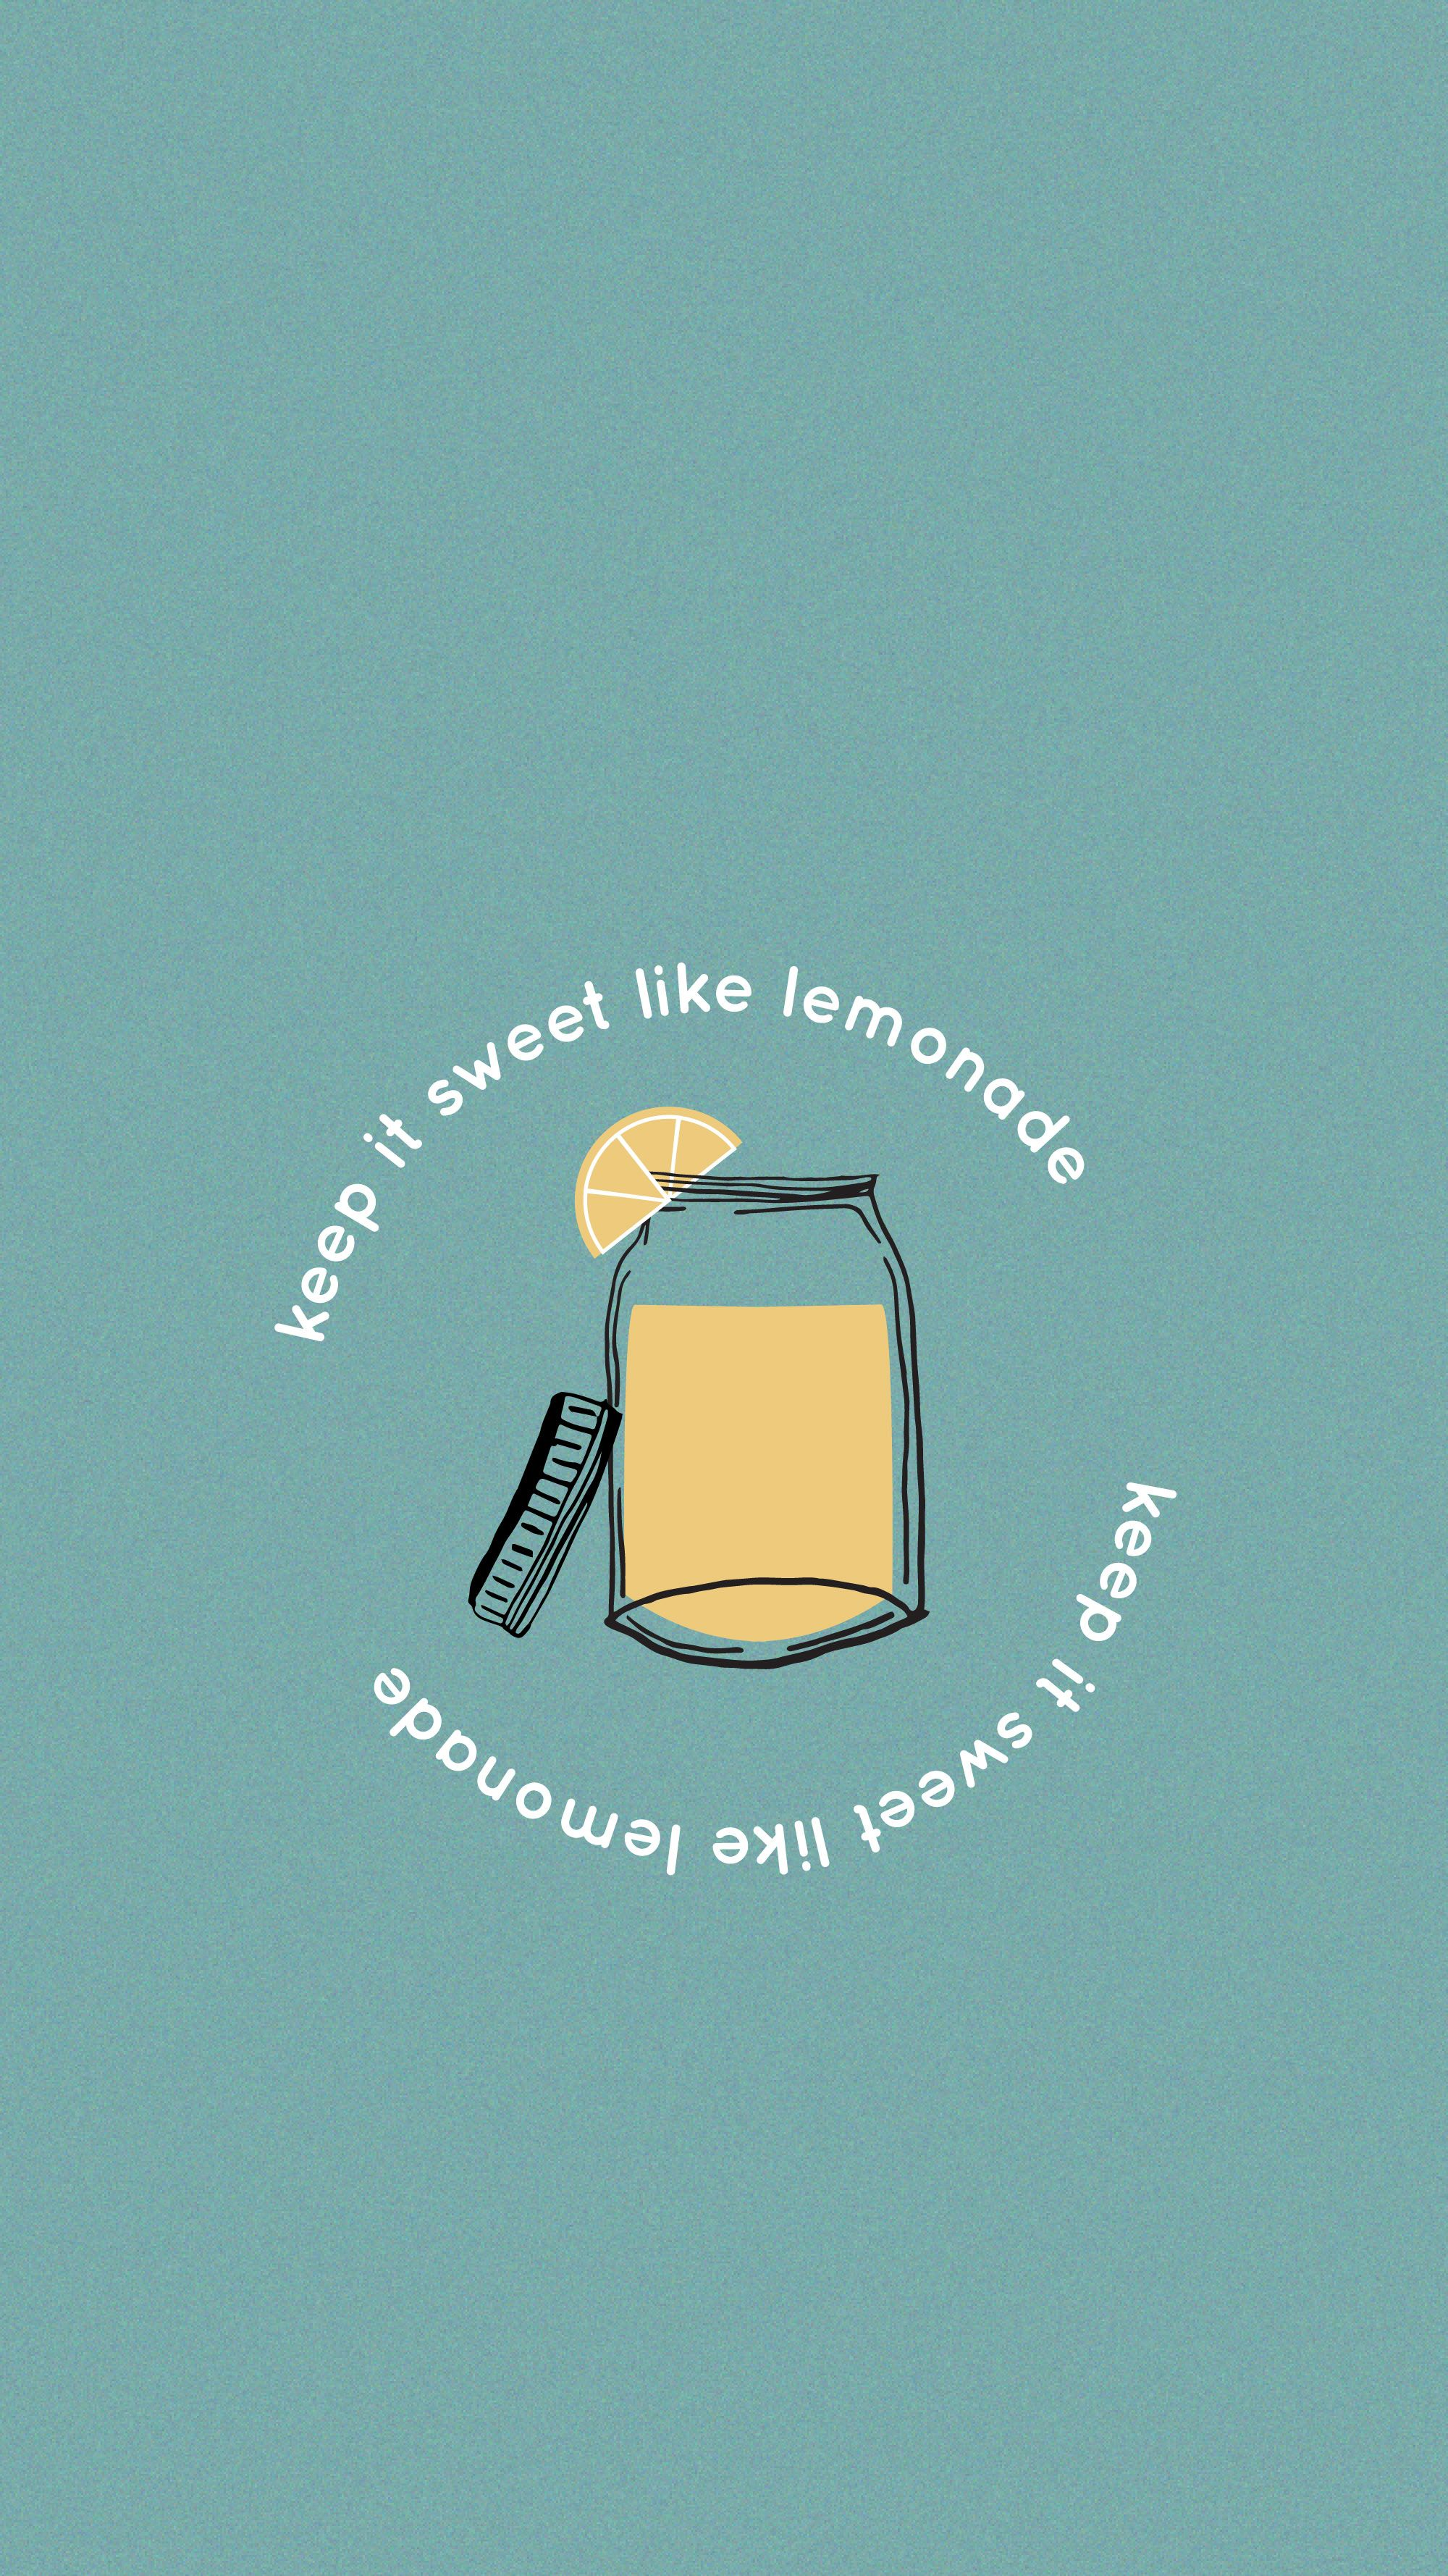 Keep It Sweet Like Lemonade Matt Wertz Wallpaper iphone 2000x3557